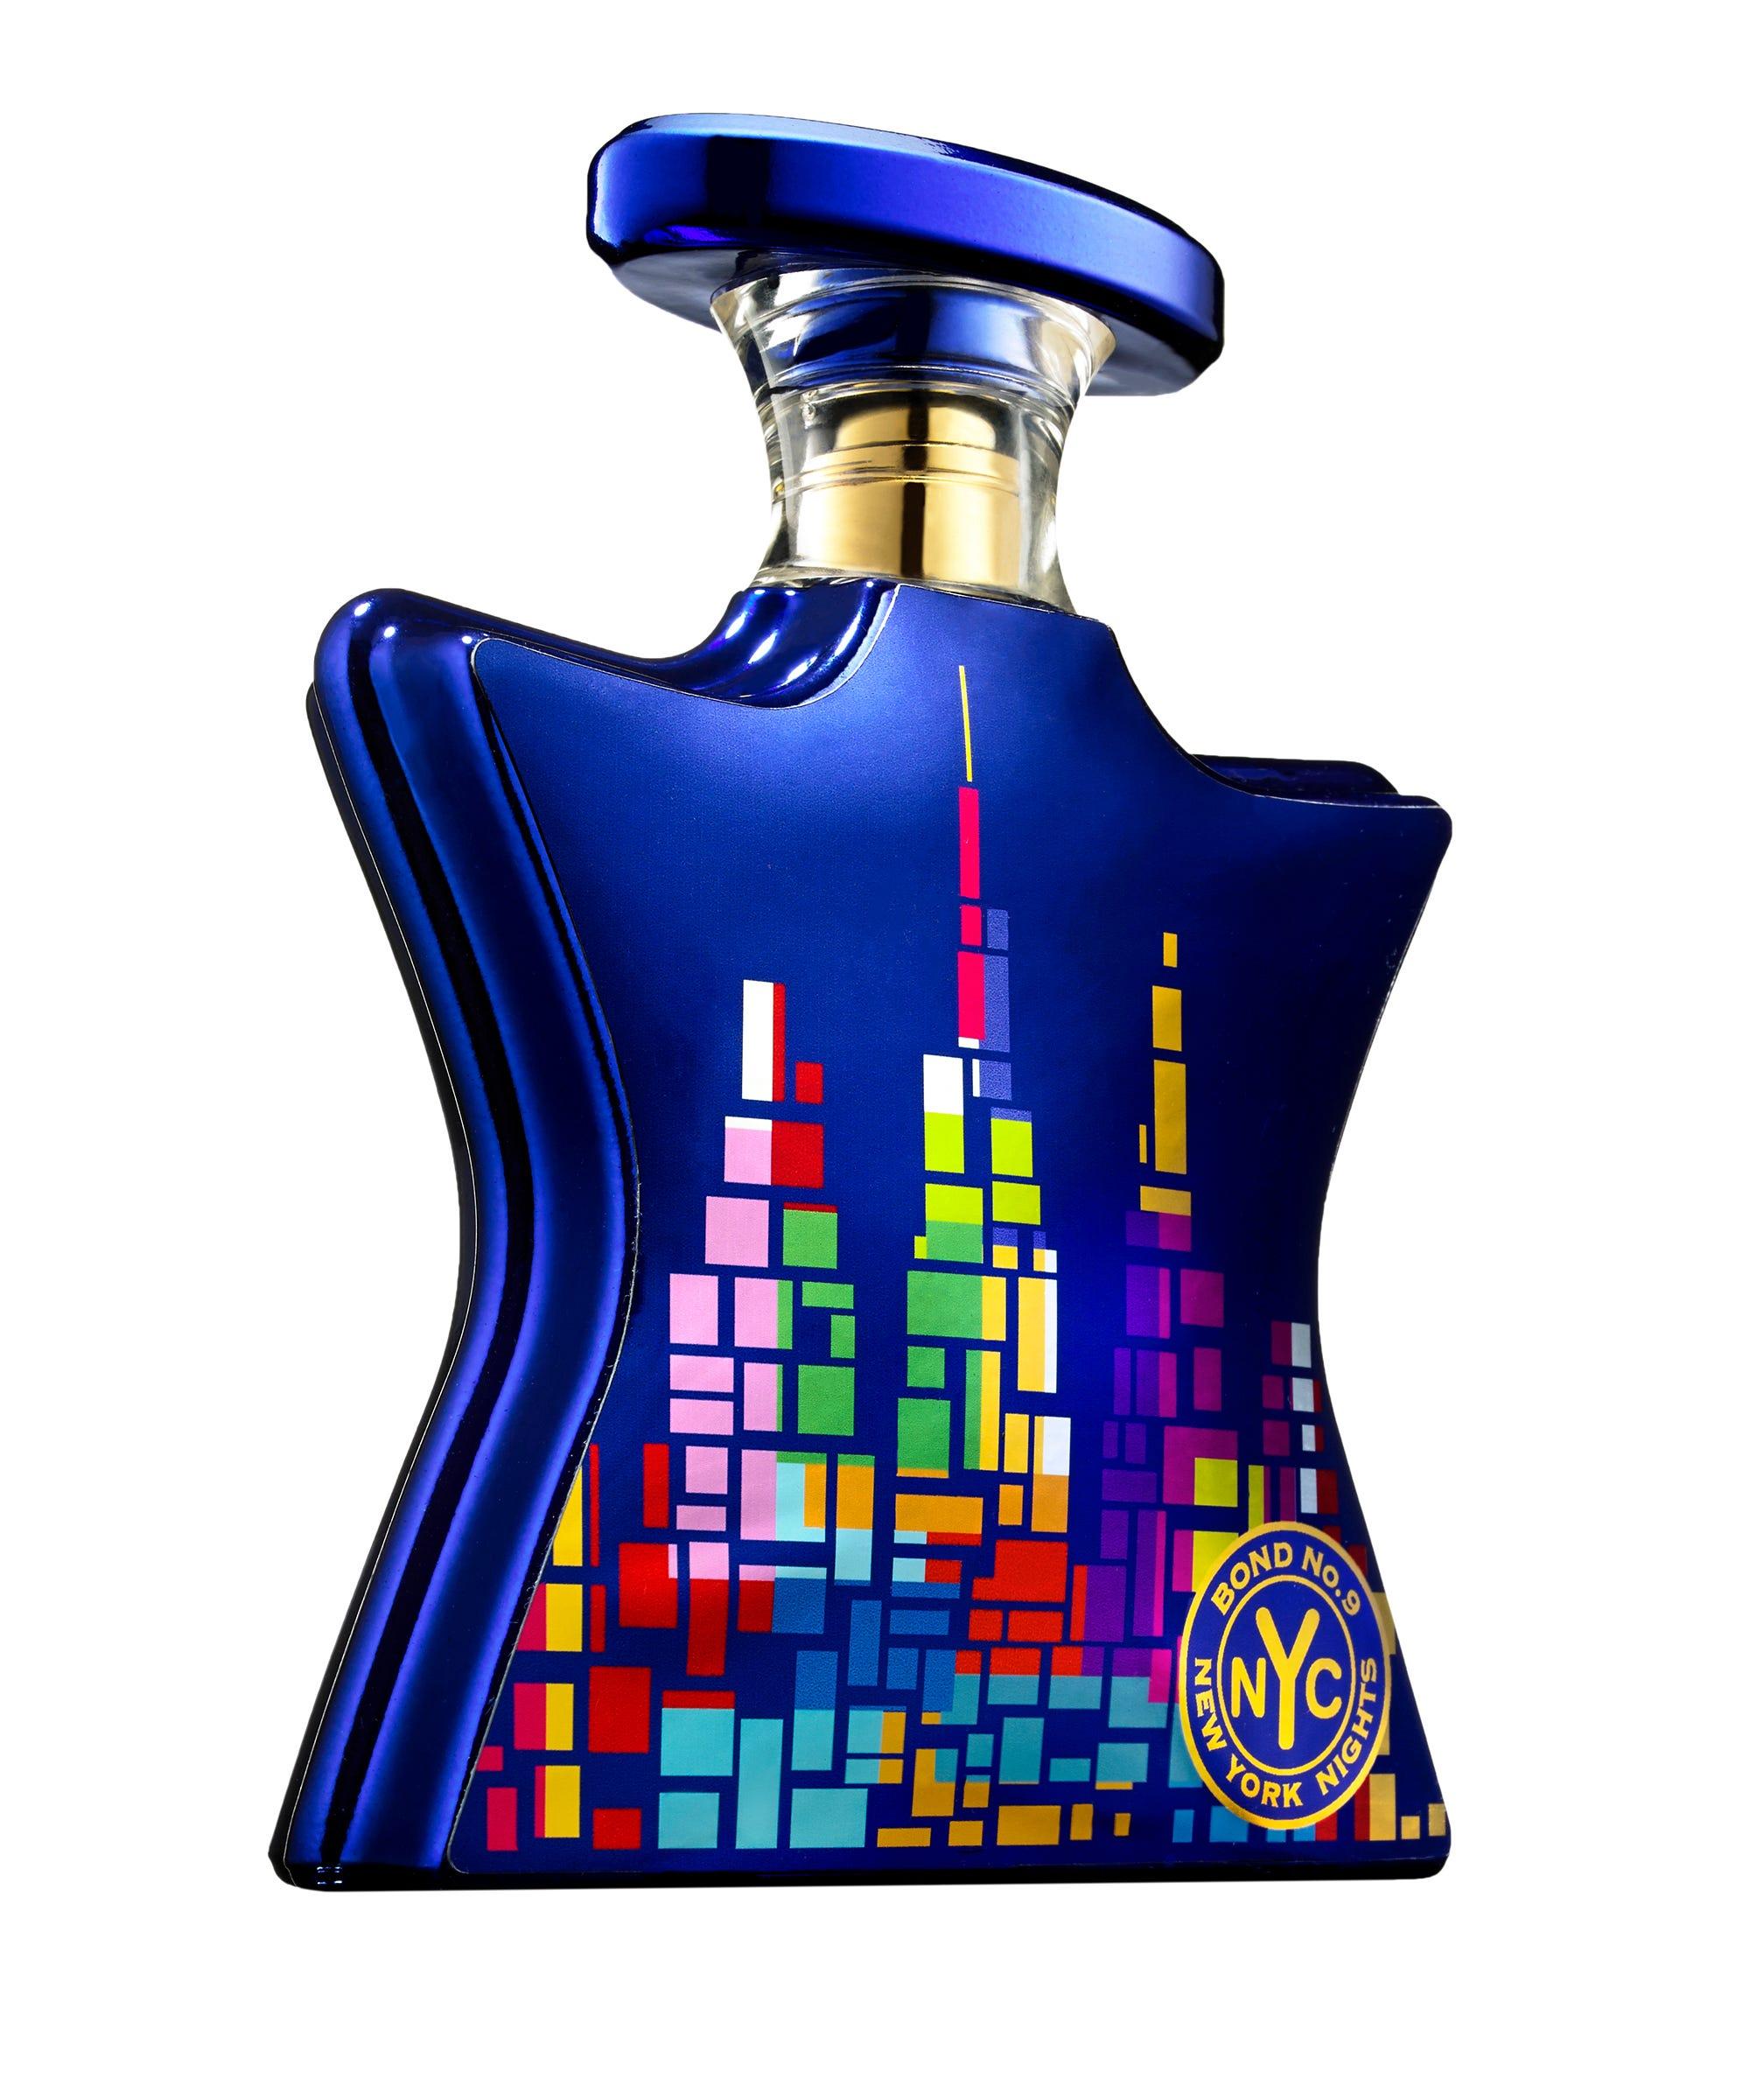 94e6d0447 NYC Inspired Perfume - Best New York City Fragrance